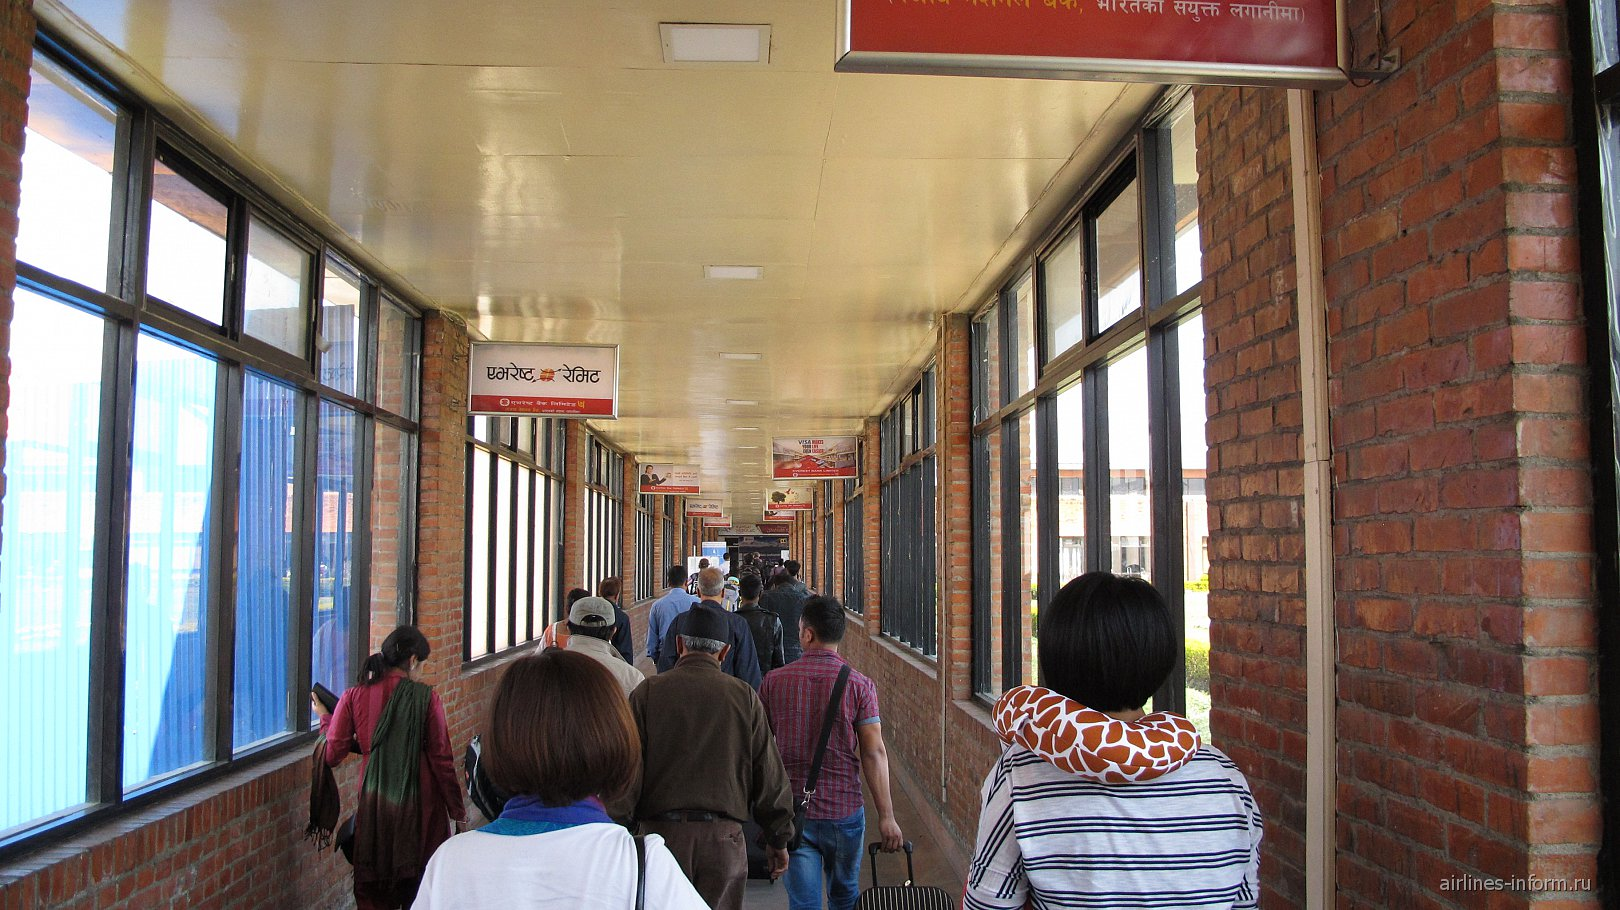 Коридор в зал иммиграционного контроля в аэропорту Катманду